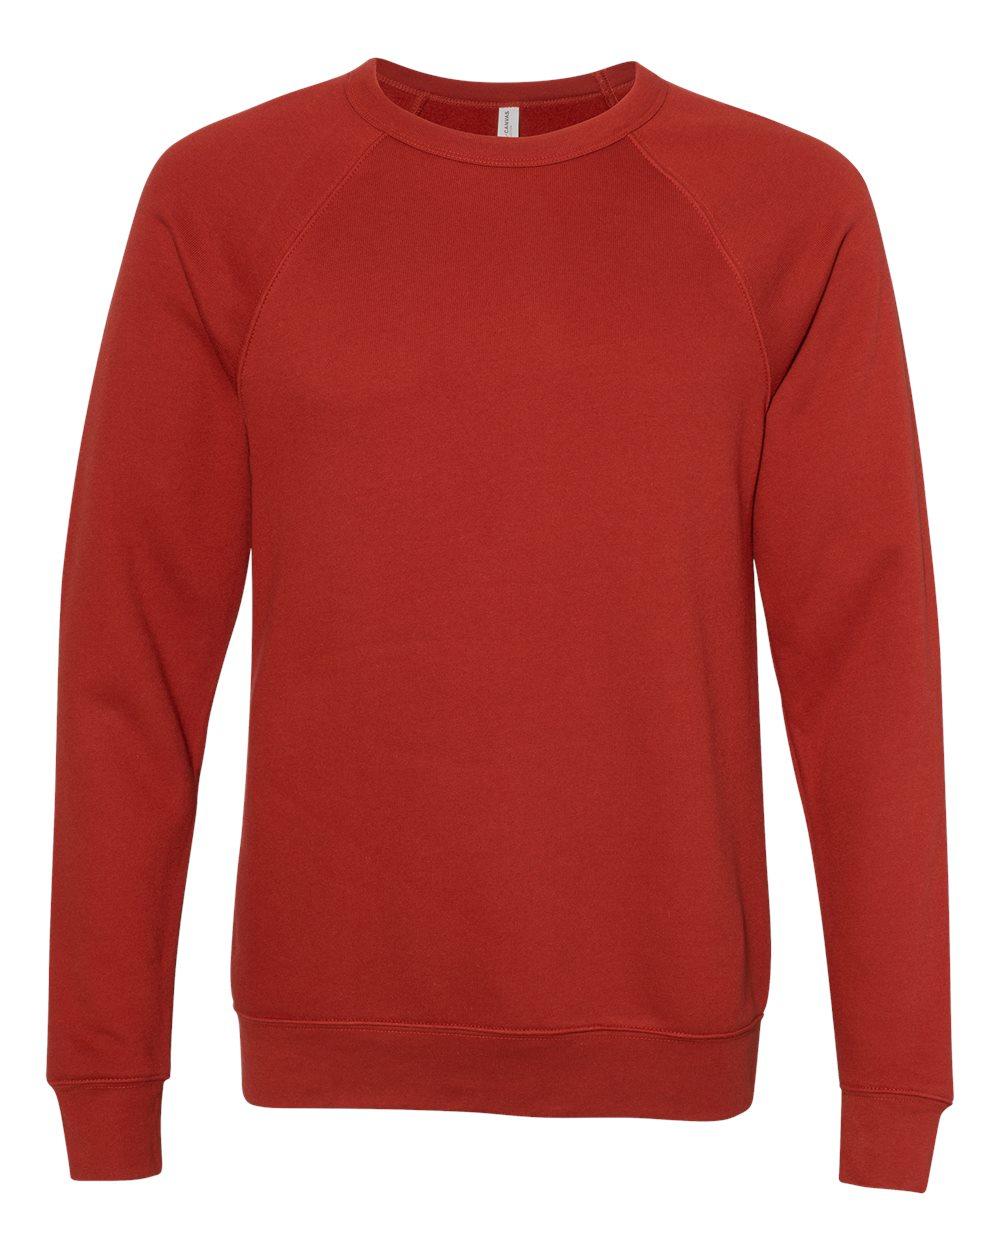 Bella-Canvas-Unisex-Sponge-Fleece-Crewneck-Sweatshirt-Top-Blank-3901-up-to-2XL thumbnail 15